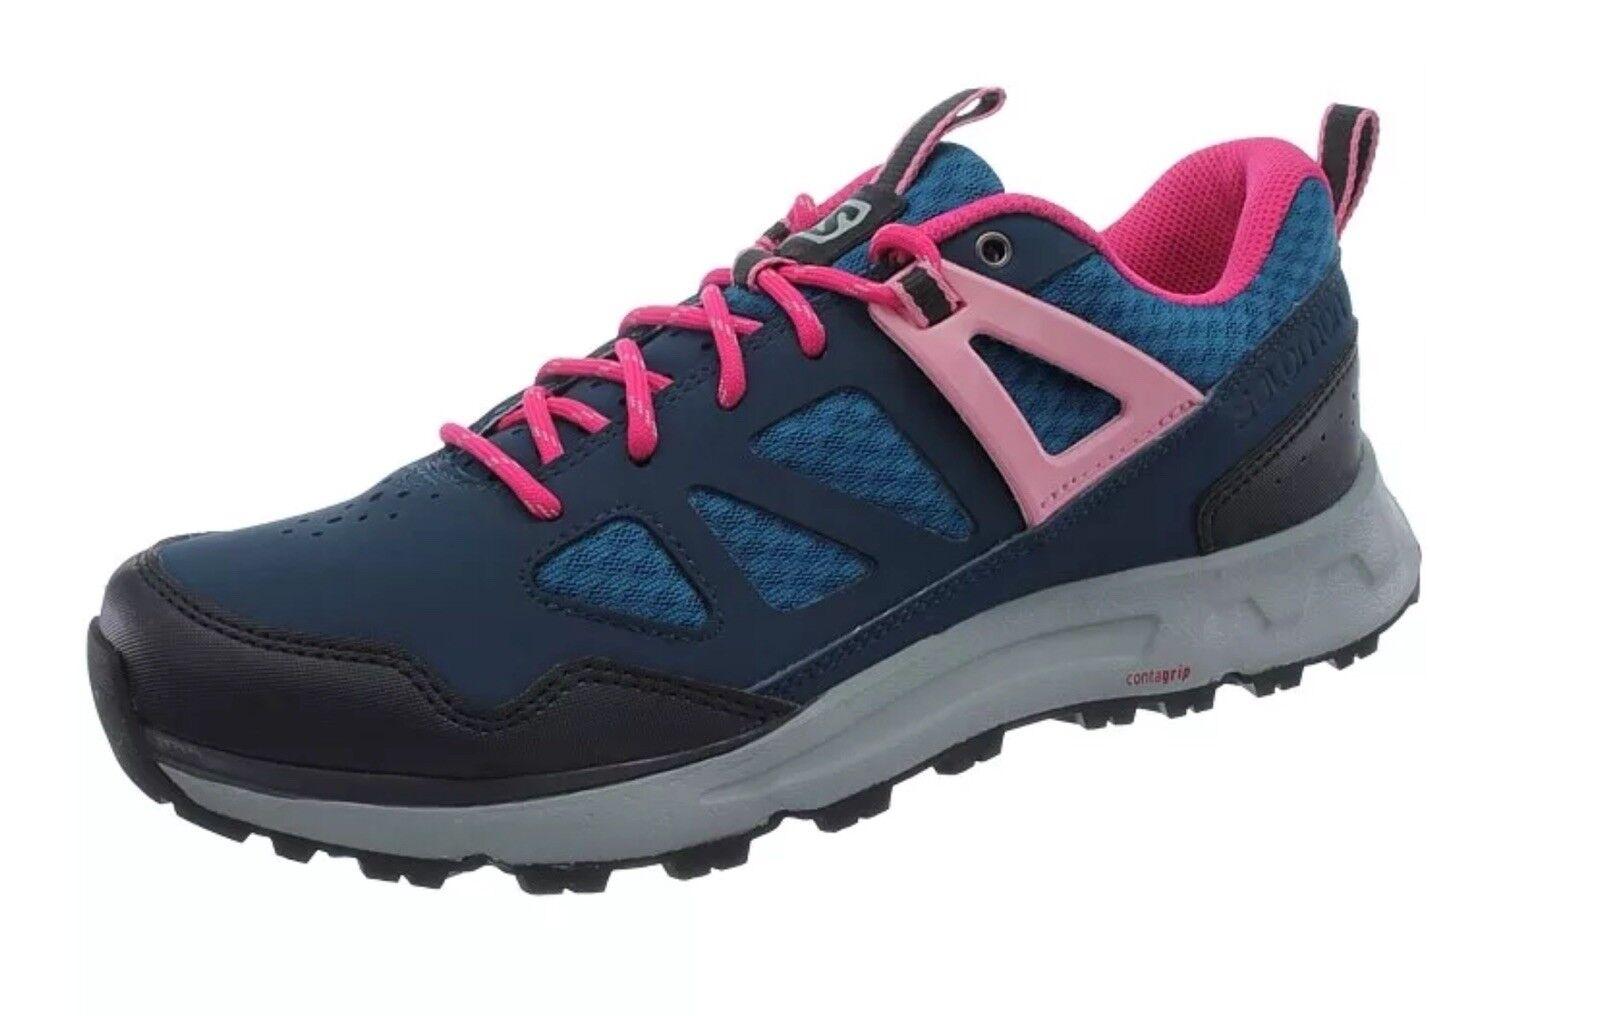 Salomon Instinct Pro women's Hiking shoes bluee pink Trekking shoes boots NEW 4.5